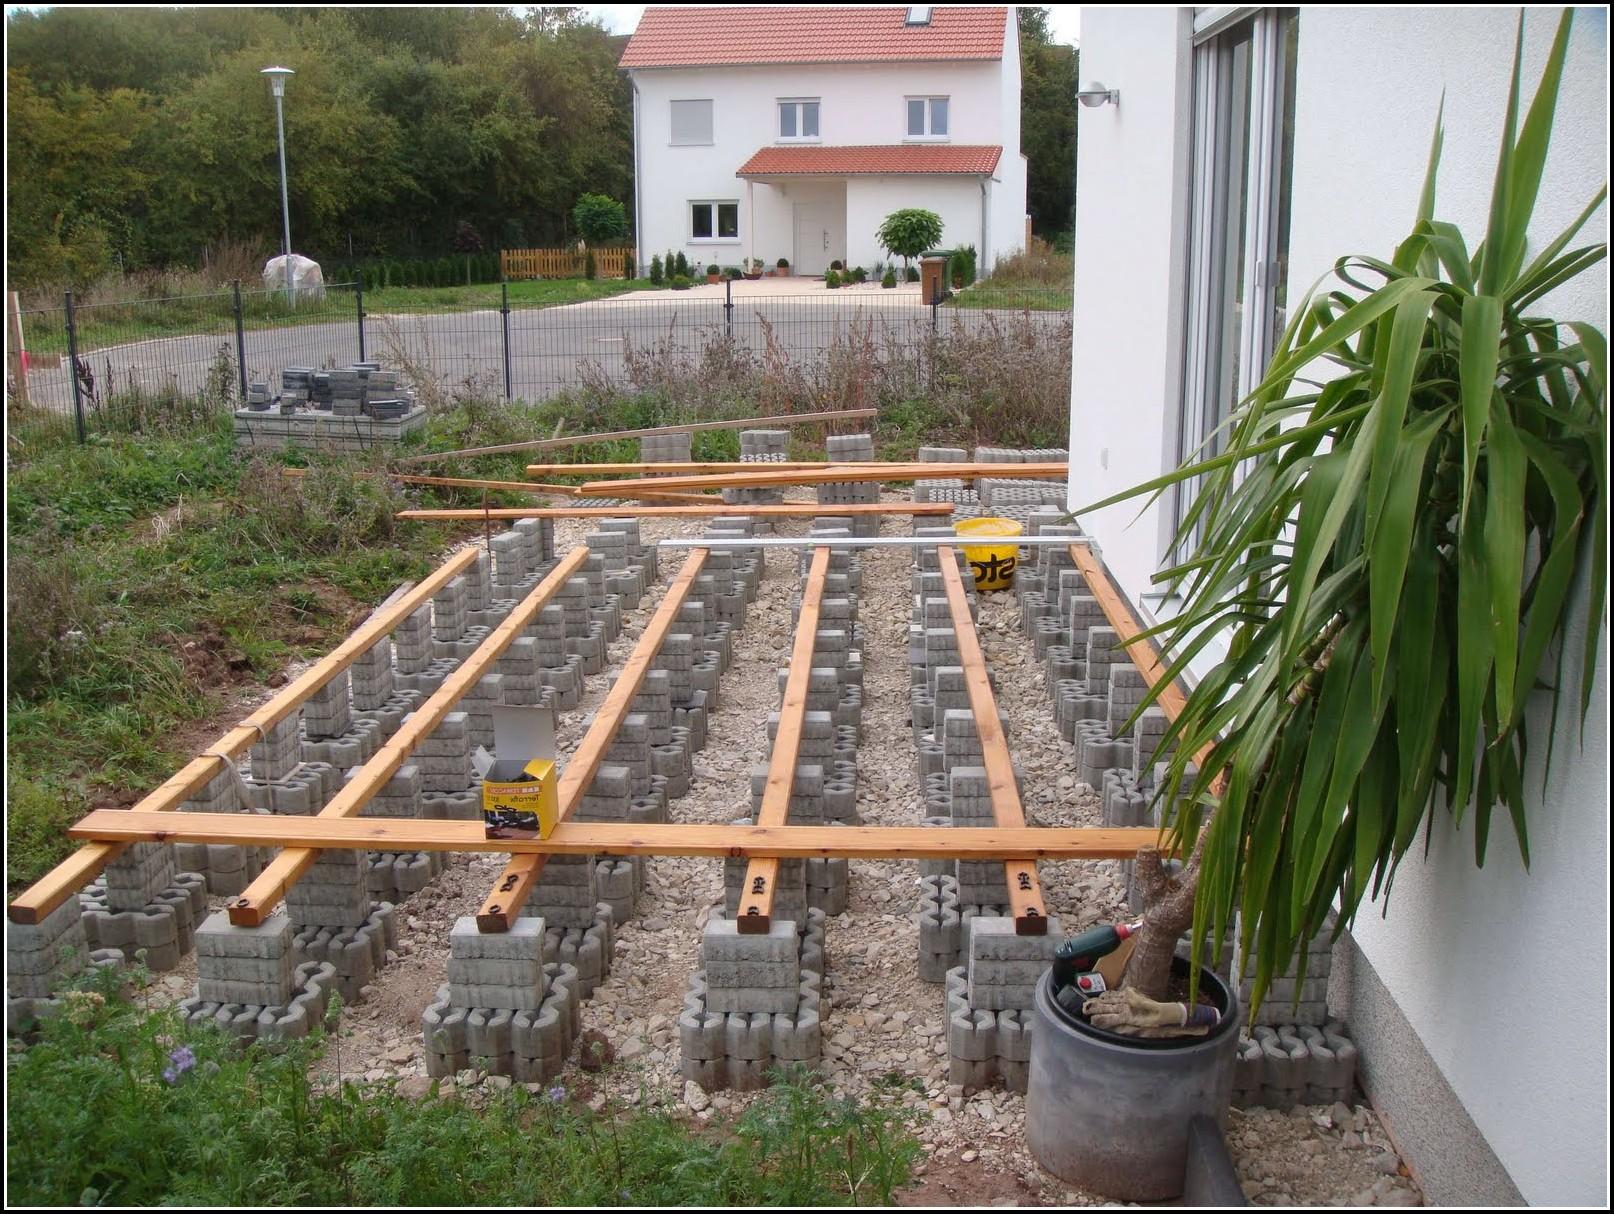 Garten Terrasse Bauen Anleitung